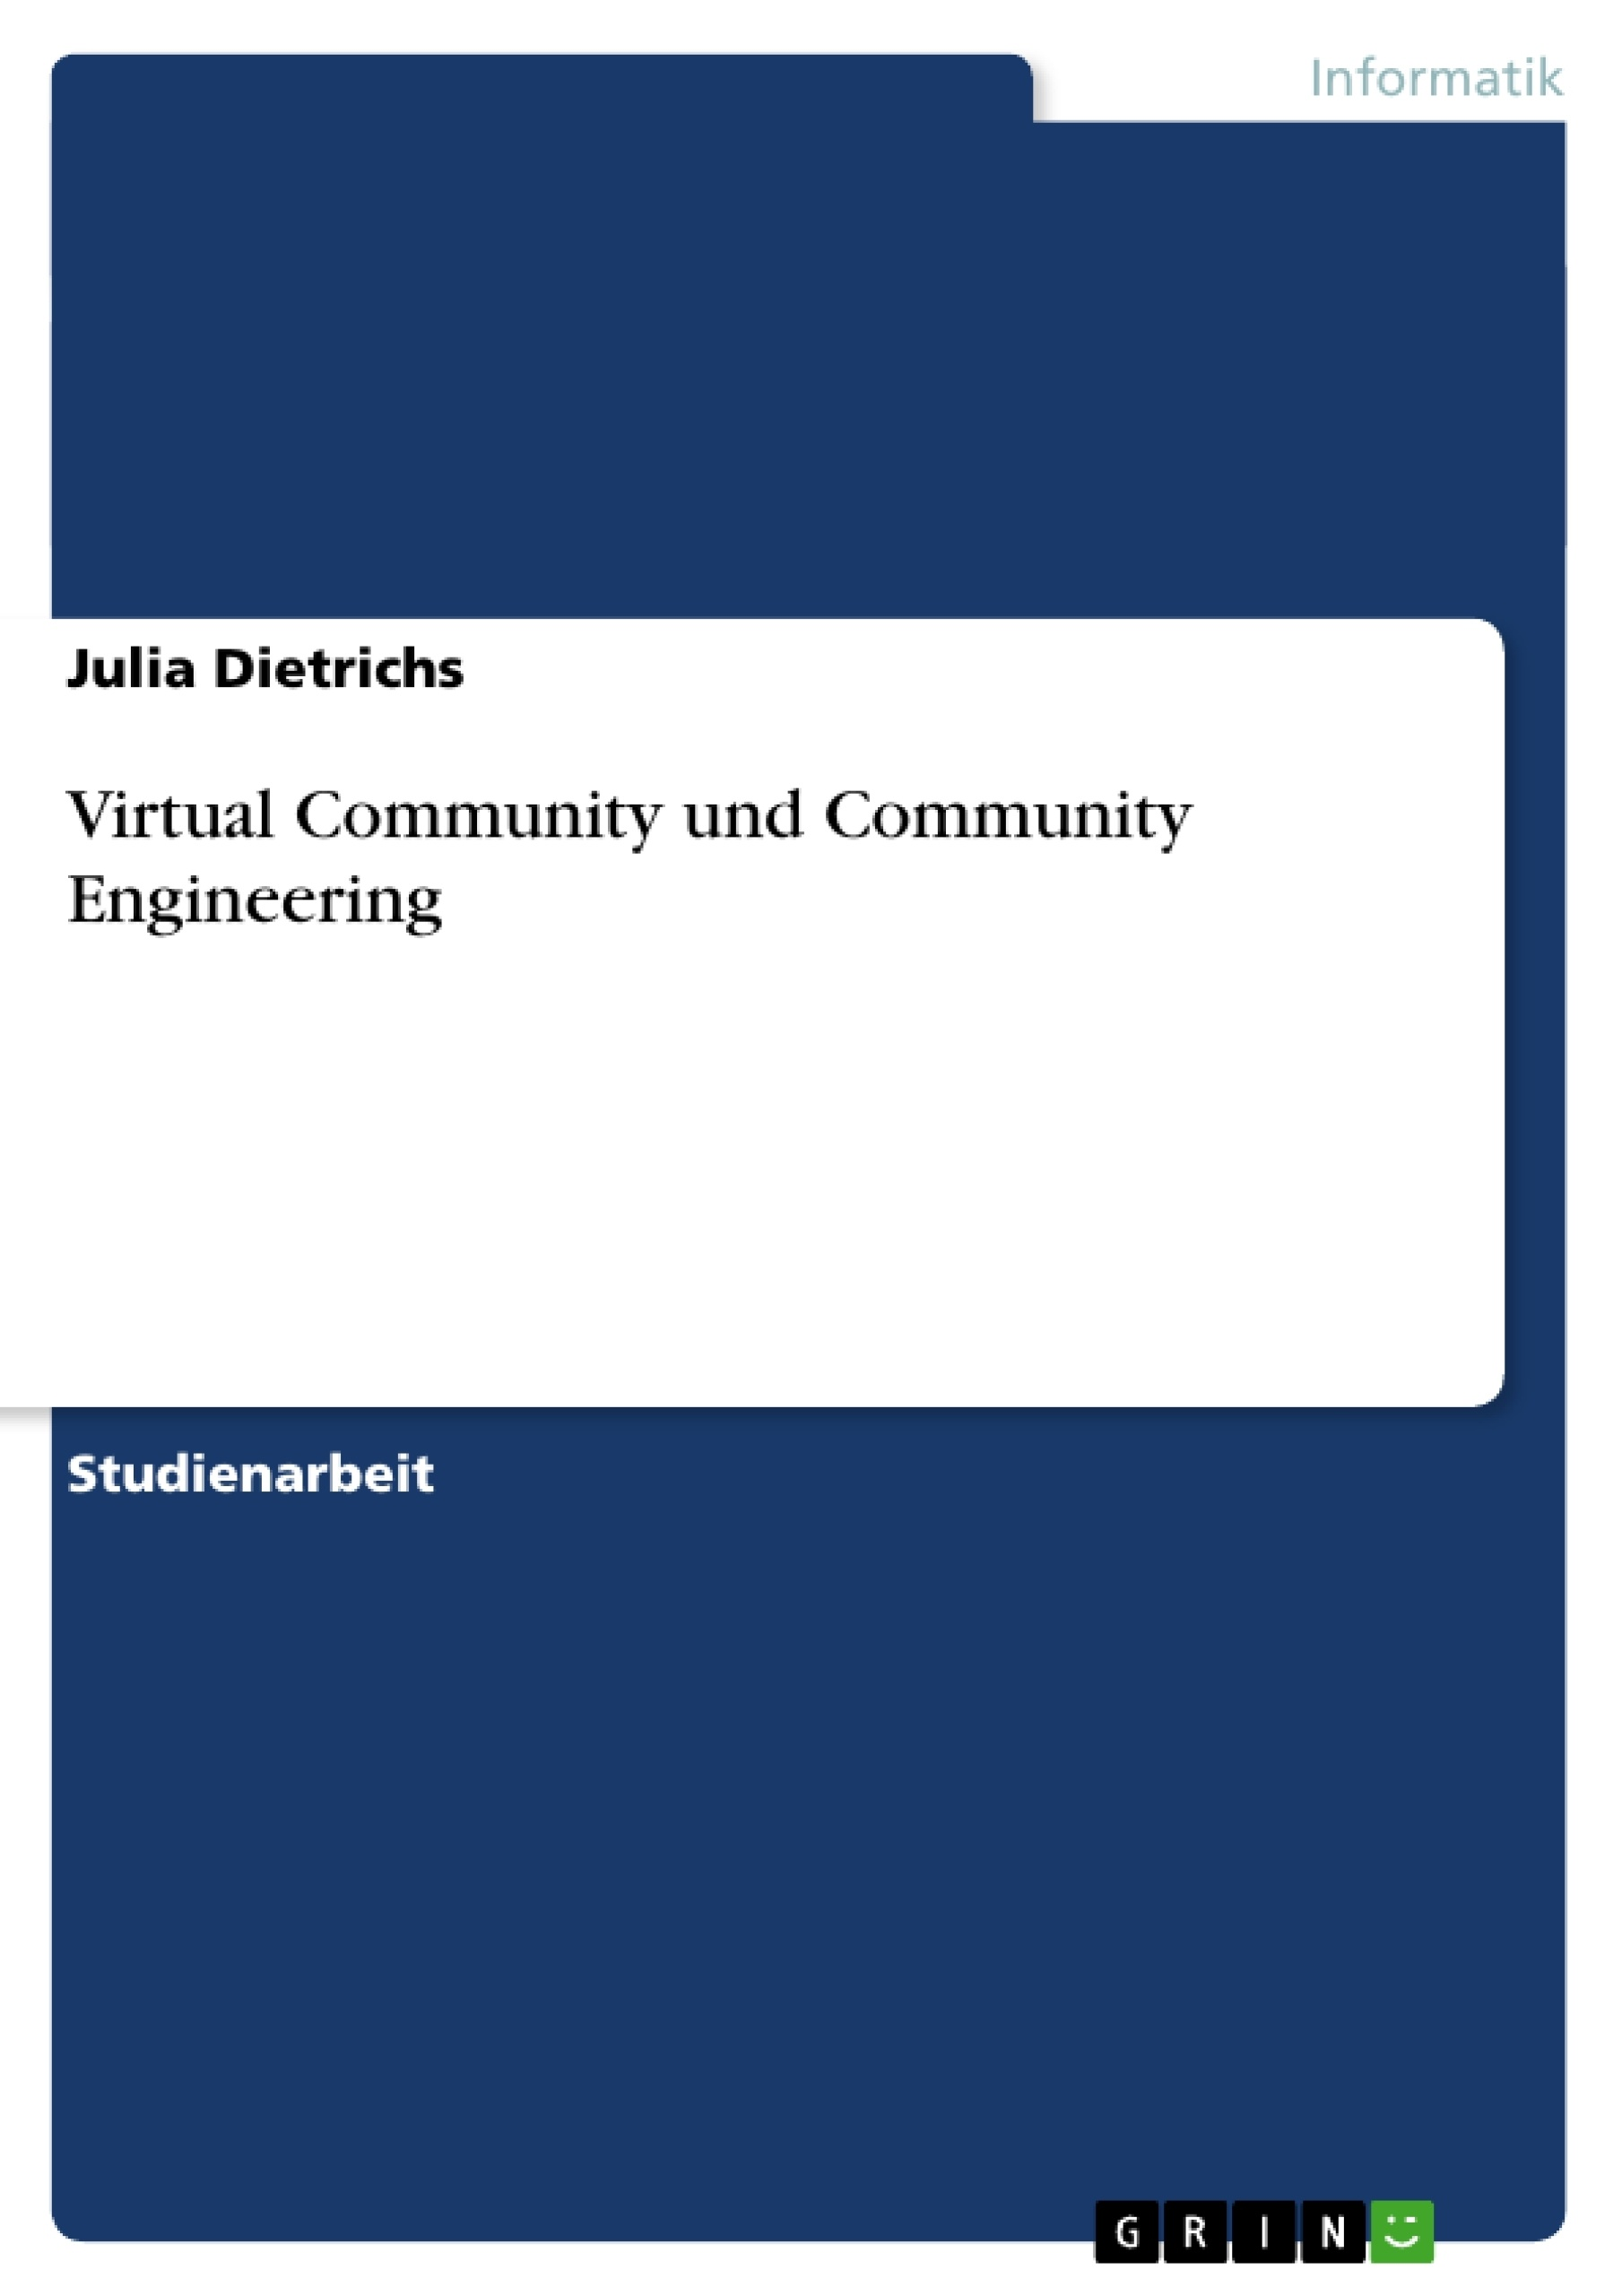 Titel: Virtual Community und Community Engineering